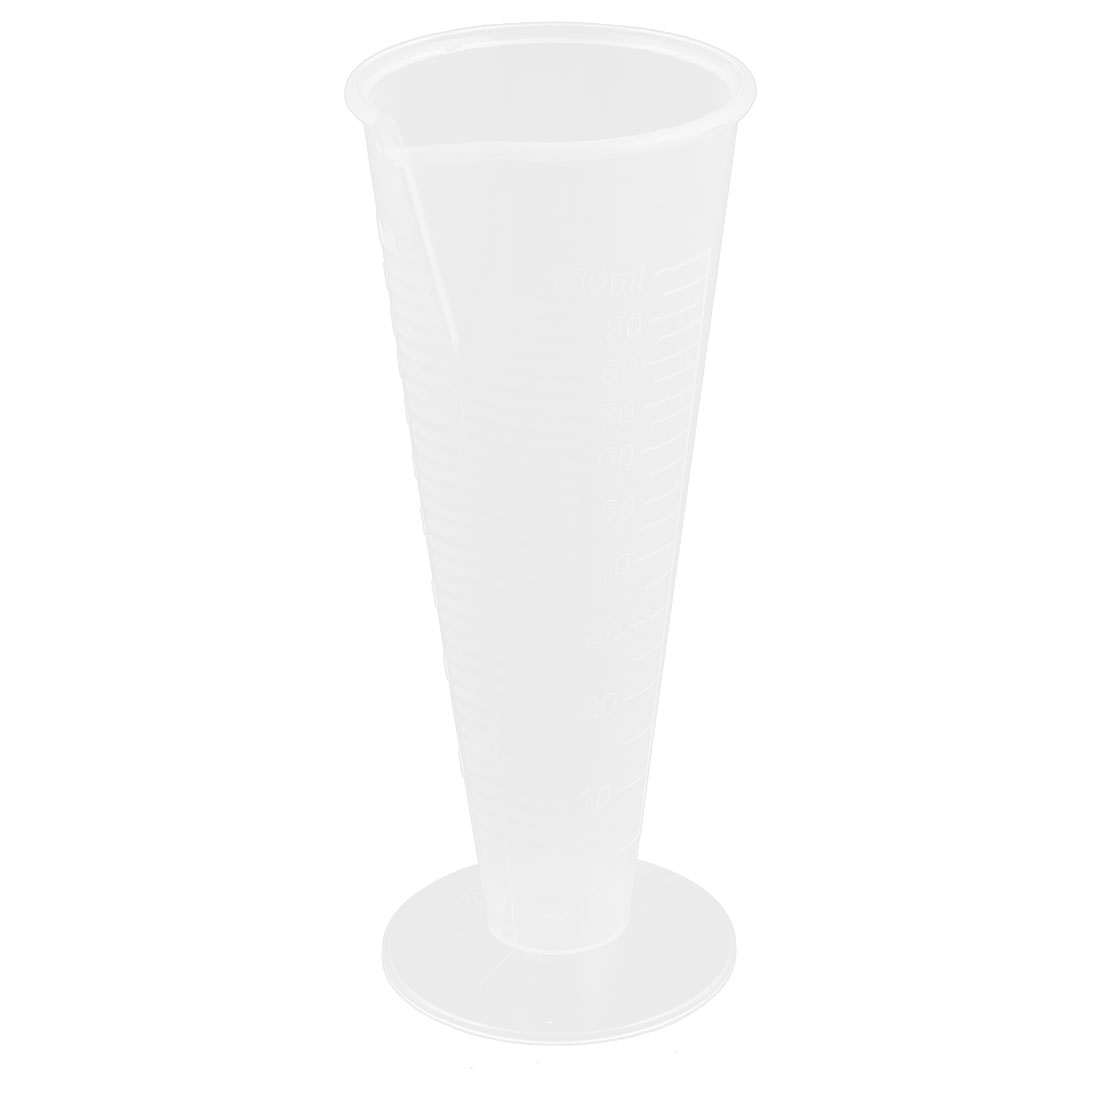 Kitchen-Laboratory-Plastic-Liquid-Measuring-Cup-Mug-Measurement-Tool-100ML